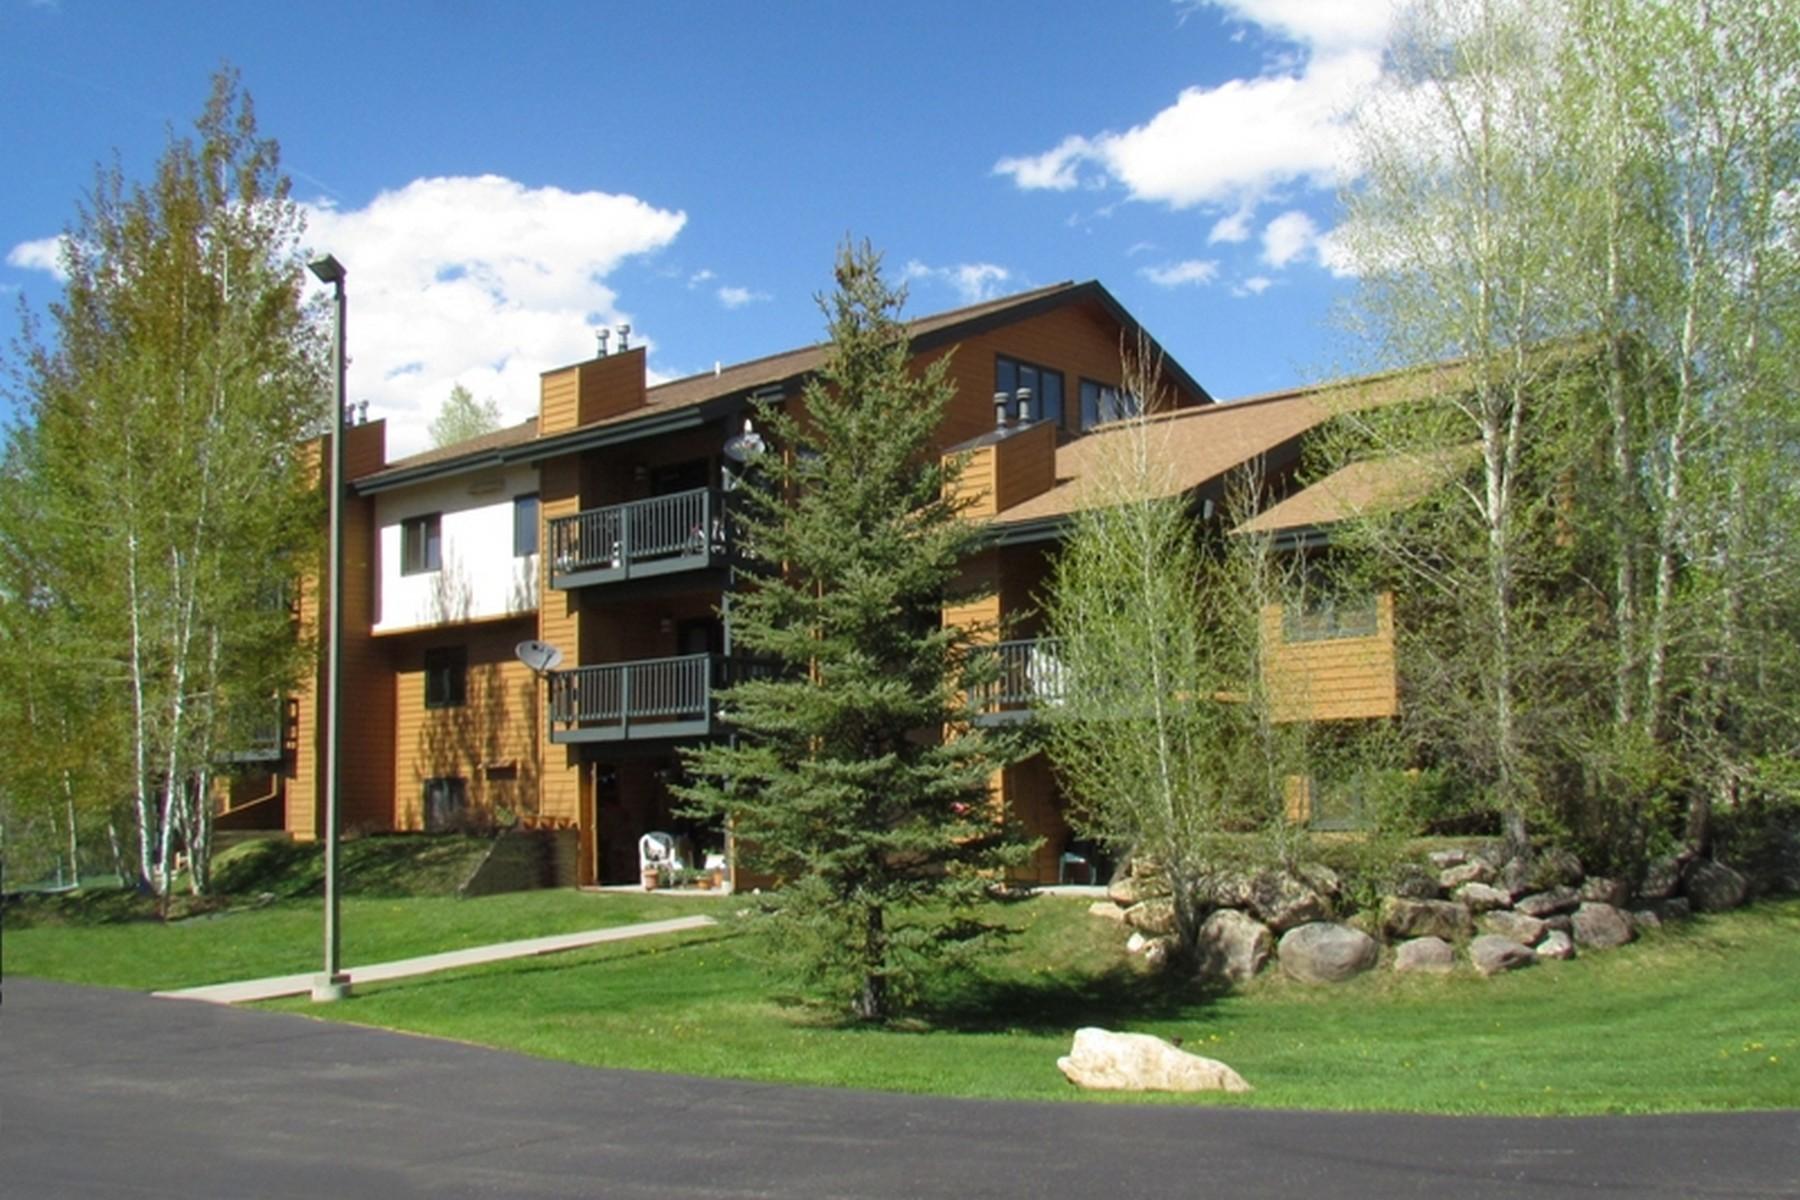 460 Ore House Plz # 302E, Steamboat Springs, CO 80487